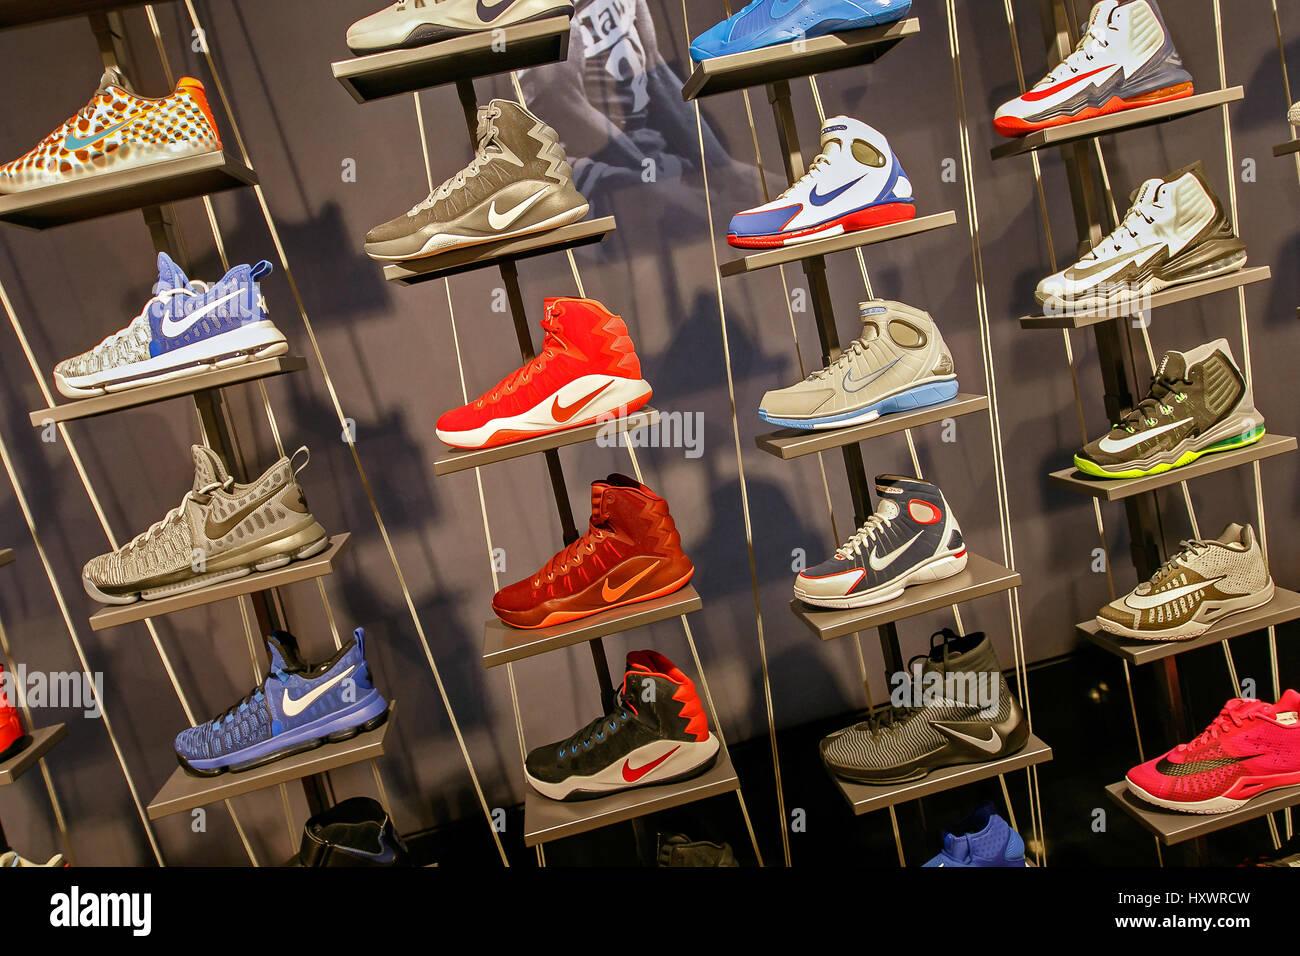 Un assortimento di scarpe da basket Nike in vendita nel negozio di NBA in  Manhattan. 0f4813fc2fe